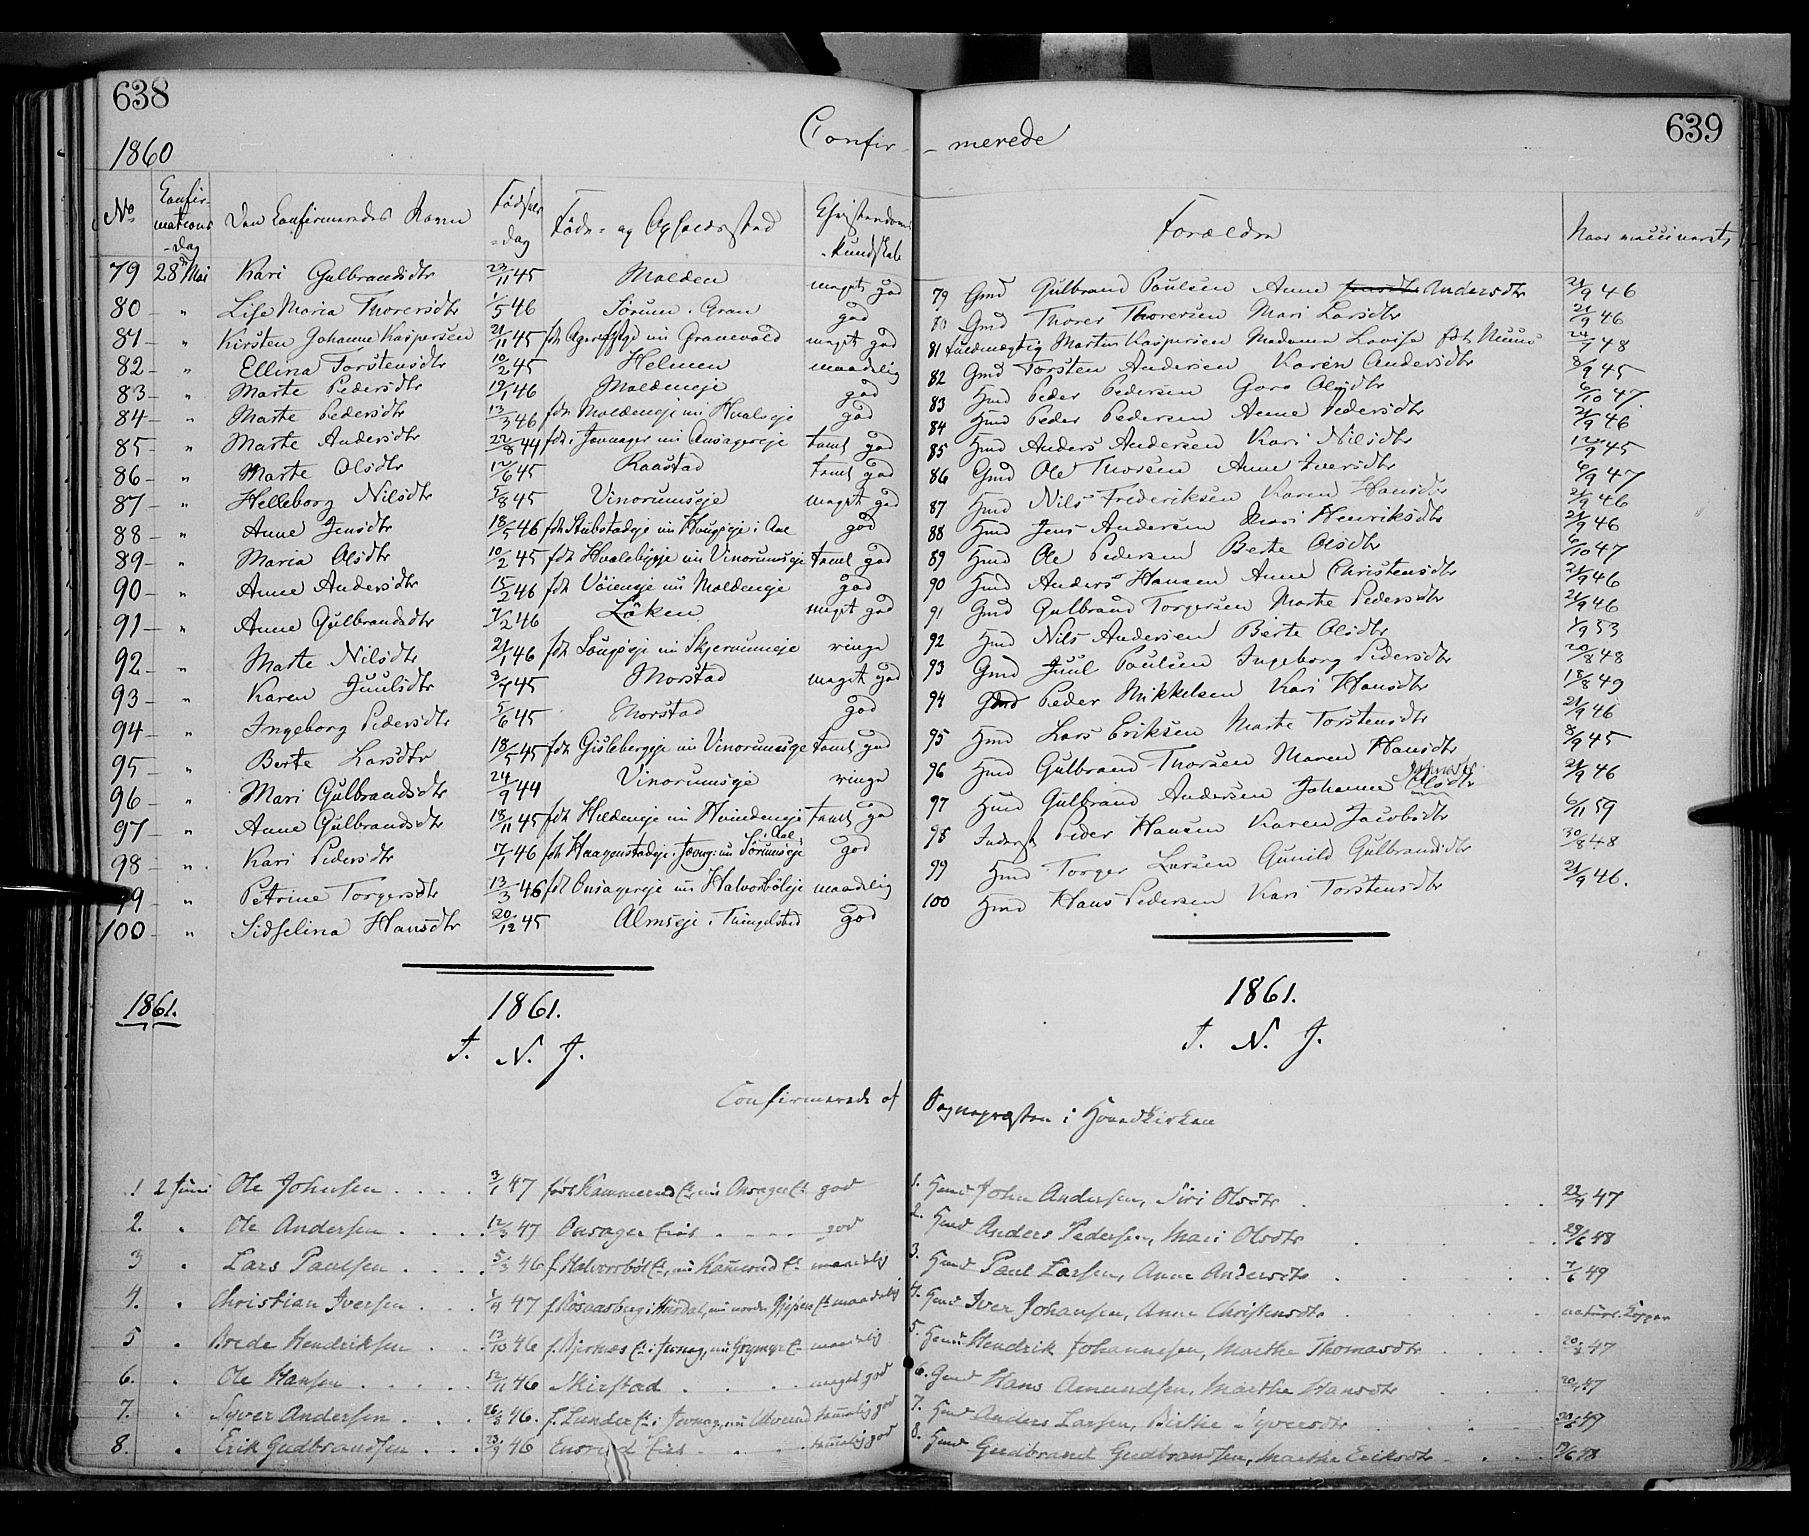 SAH, Gran prestekontor, Ministerialbok nr. 12, 1856-1874, s. 638-639